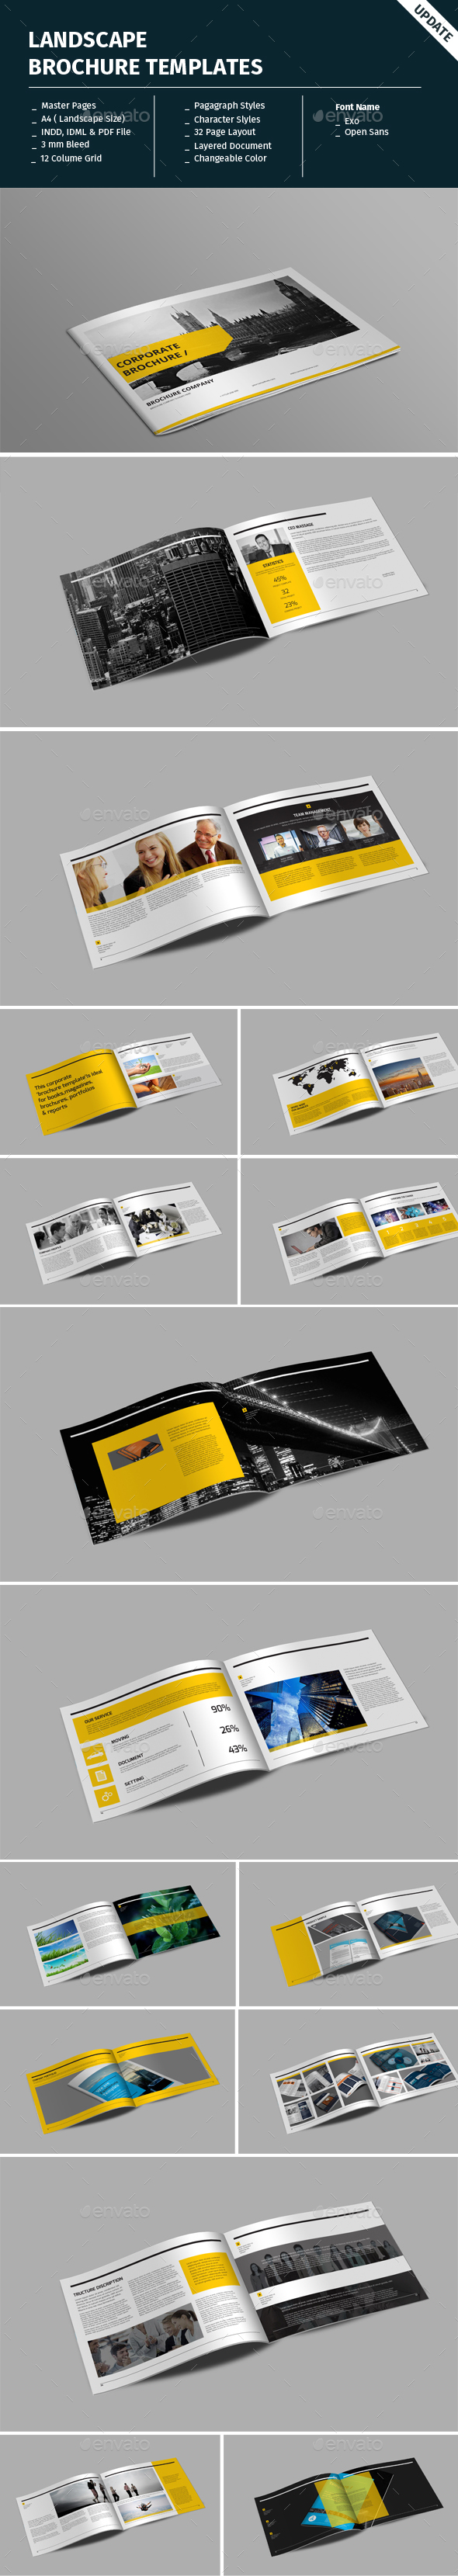 Landscape Brochure Templates - Informational Brochures